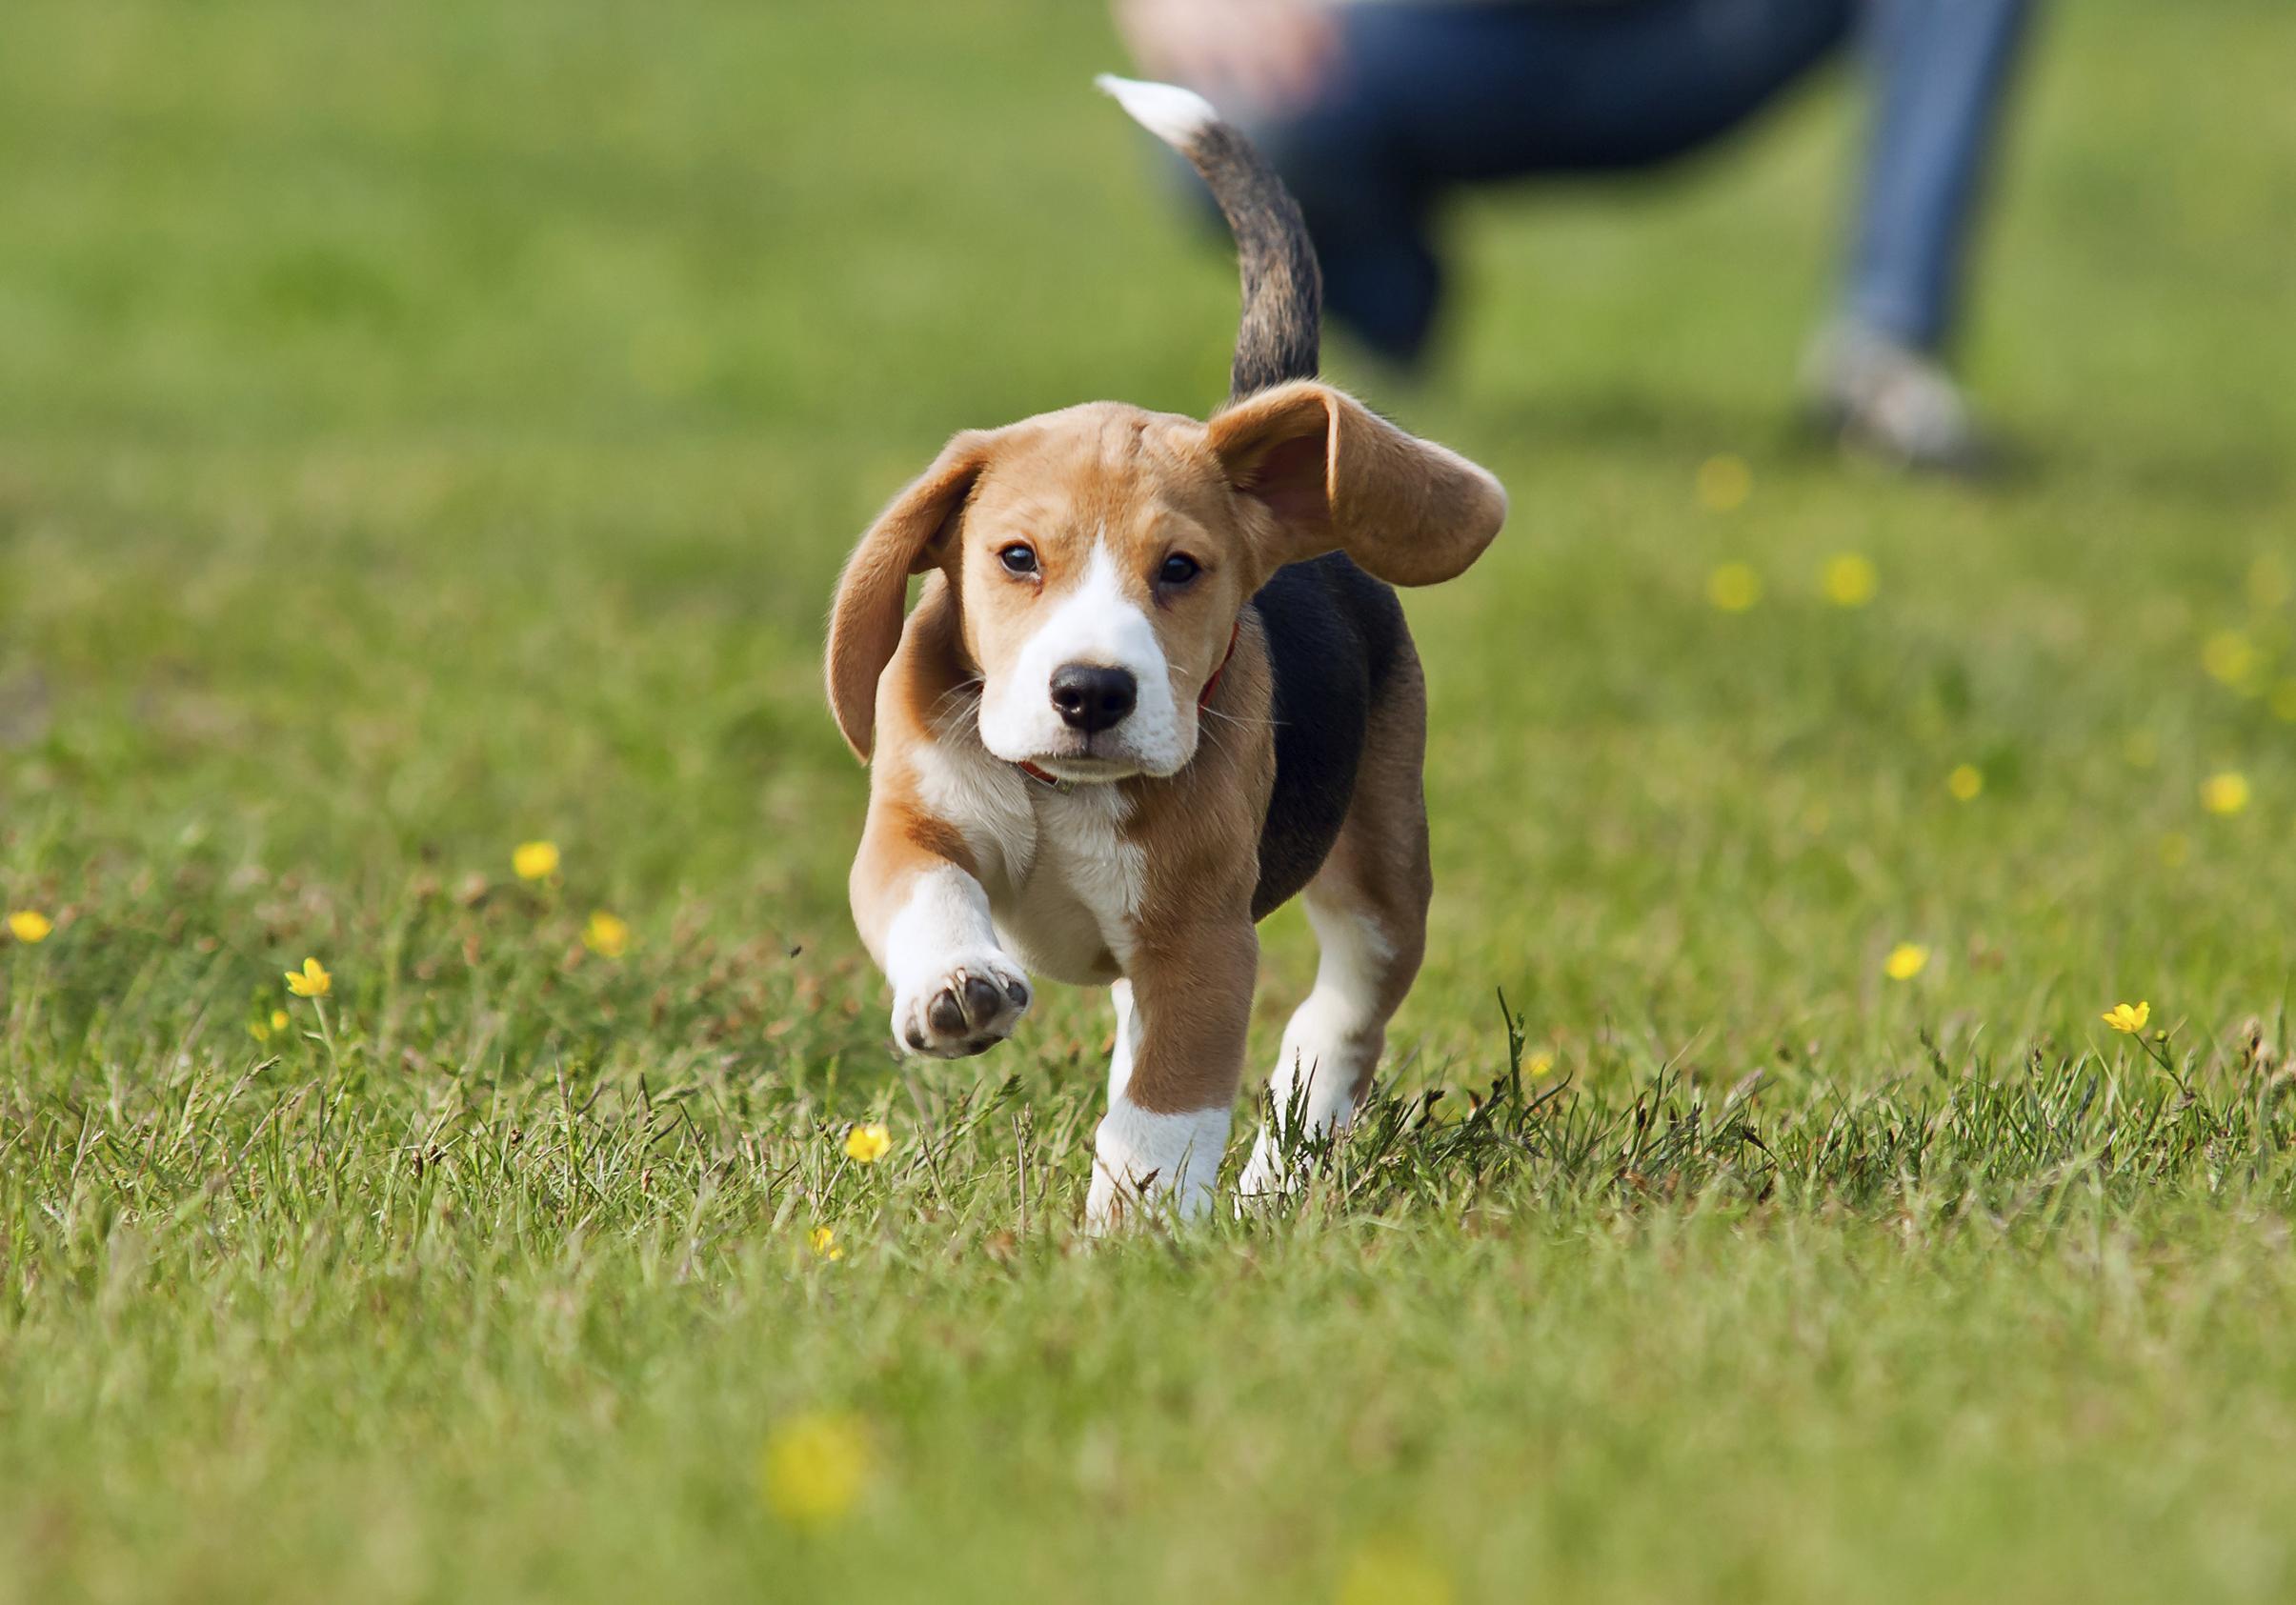 Running beagle puppy at the walk